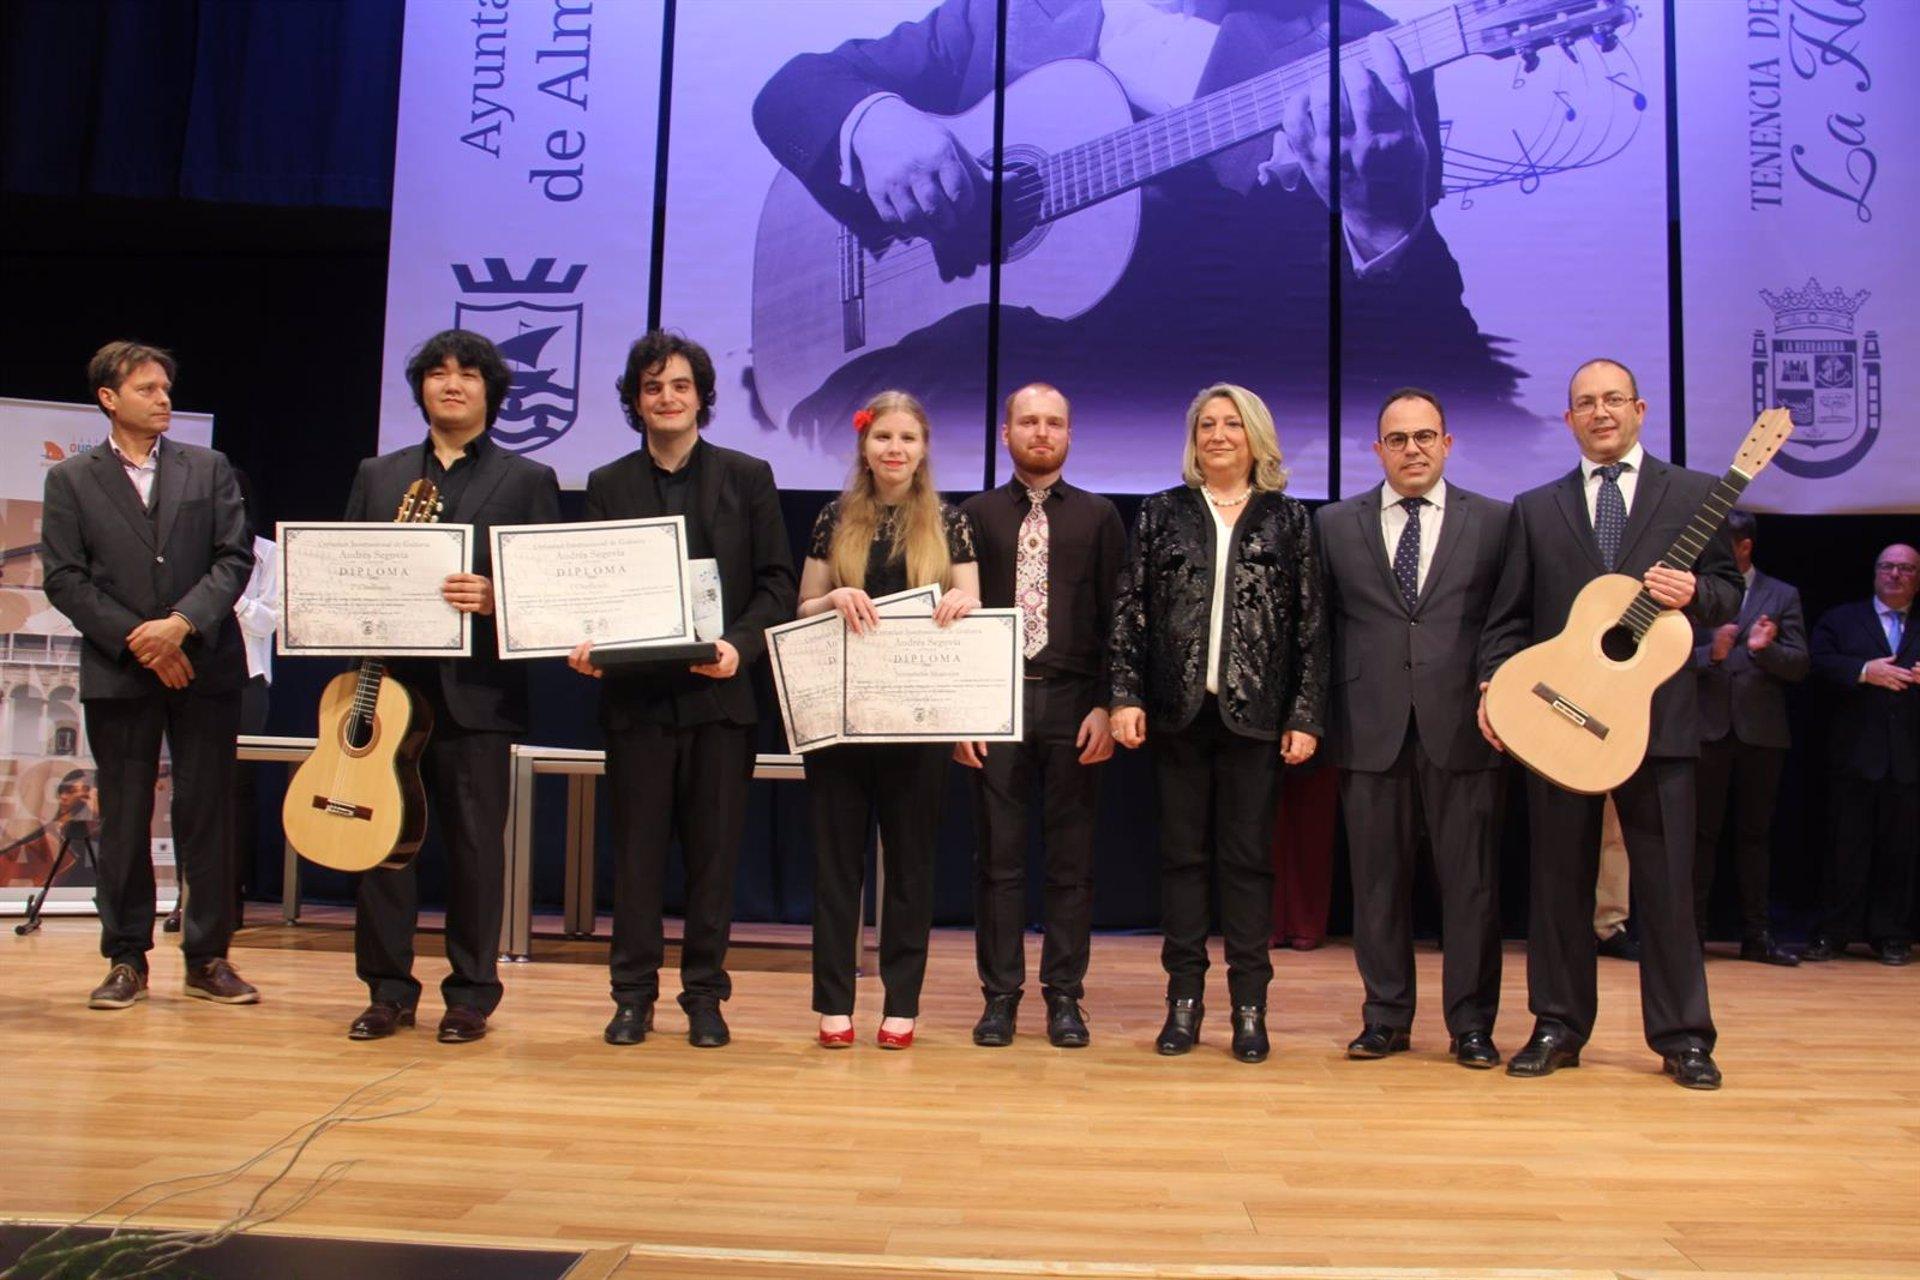 Aplazado hasta noviembre el XXXVI Certamen Internacional de Guitarra Clásica Andrés Segovia